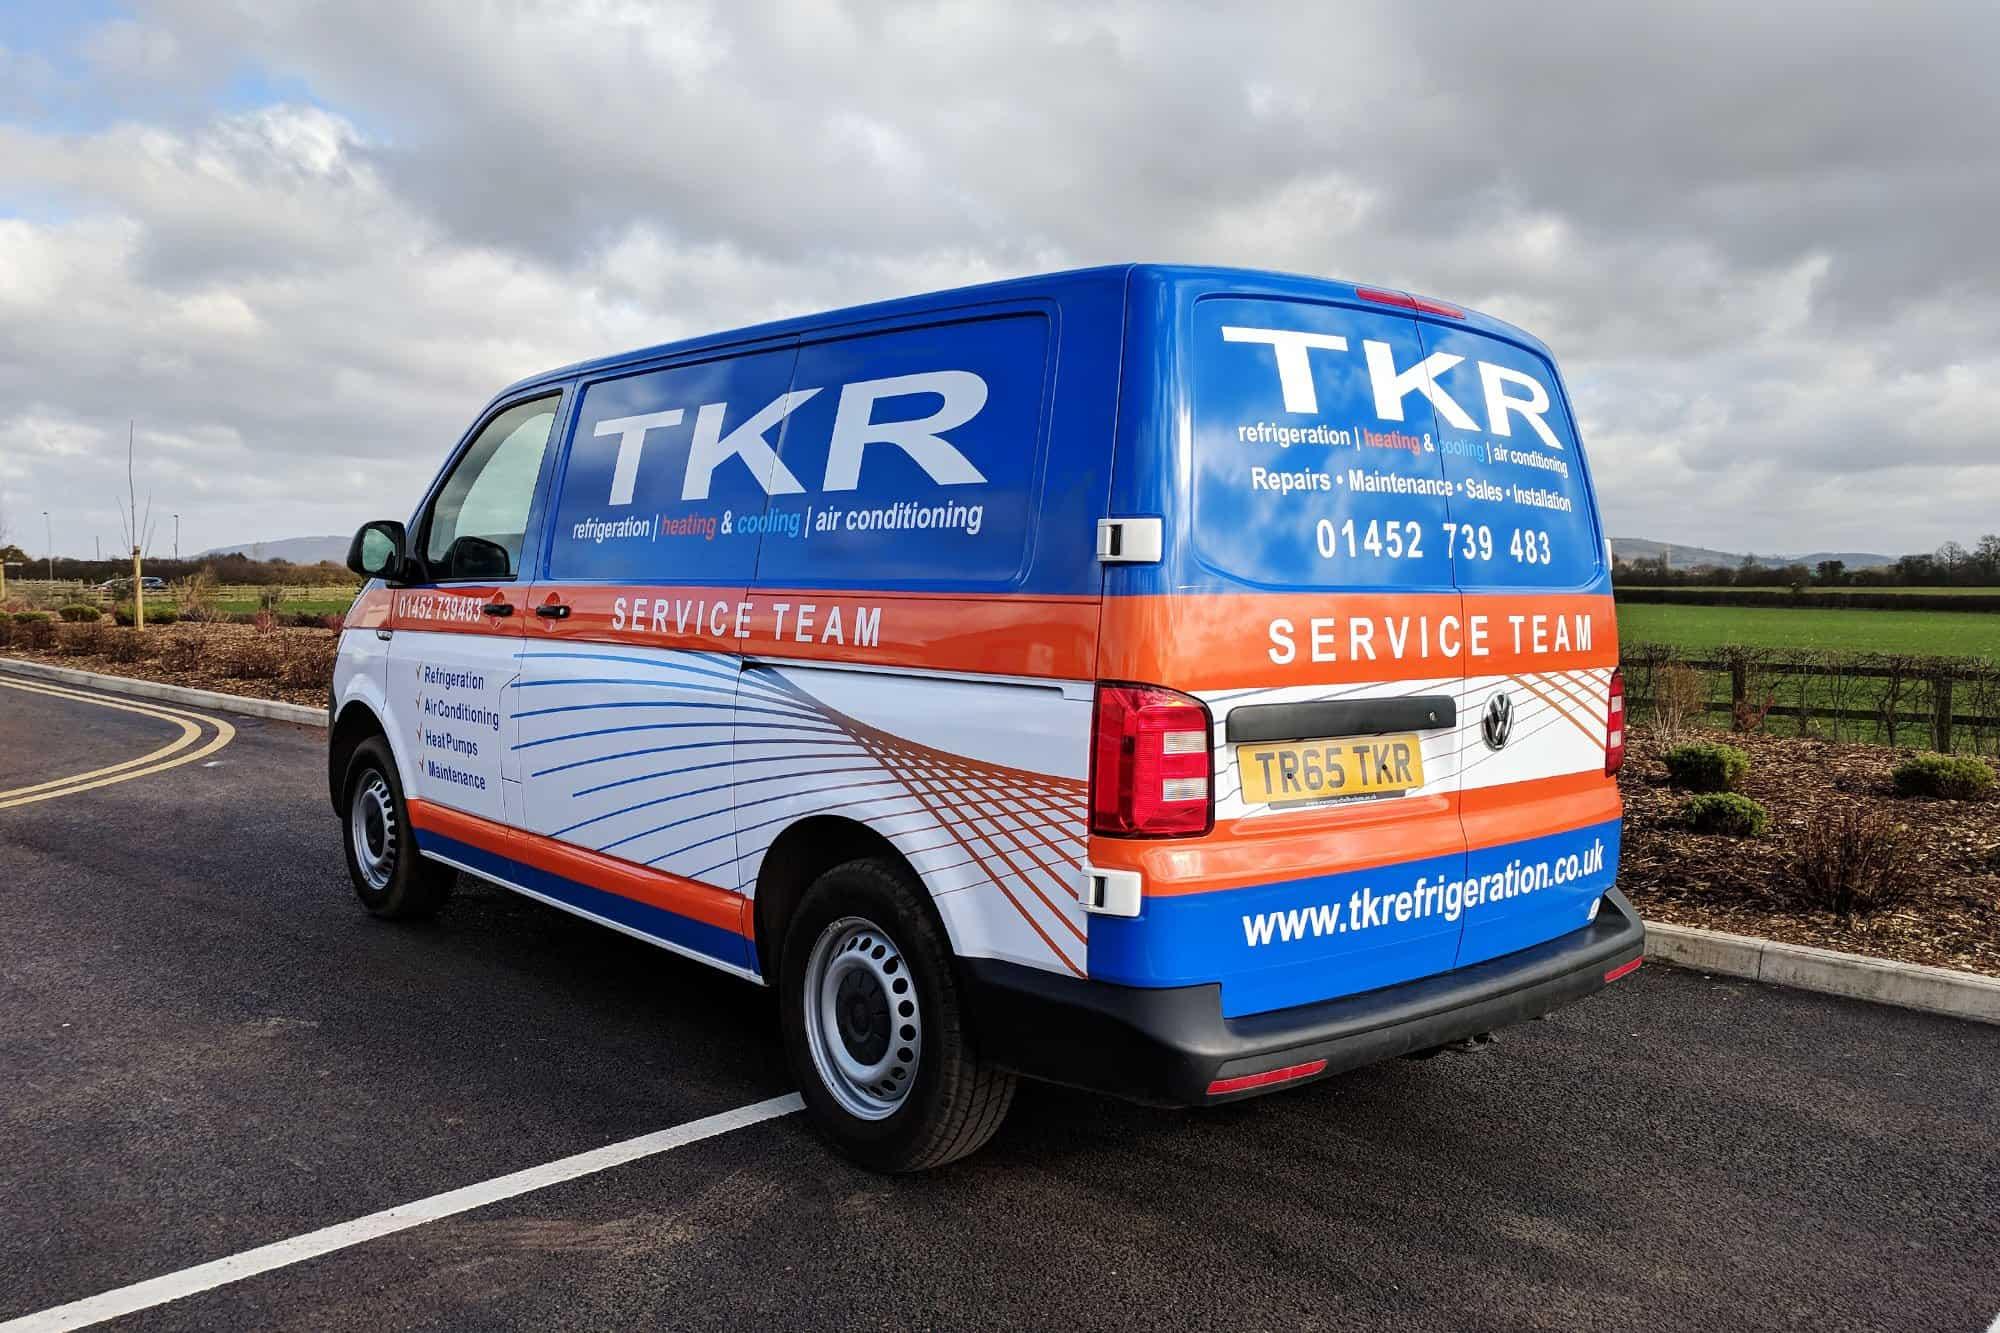 TKR T6 Wrap - fleet vehicle wraps